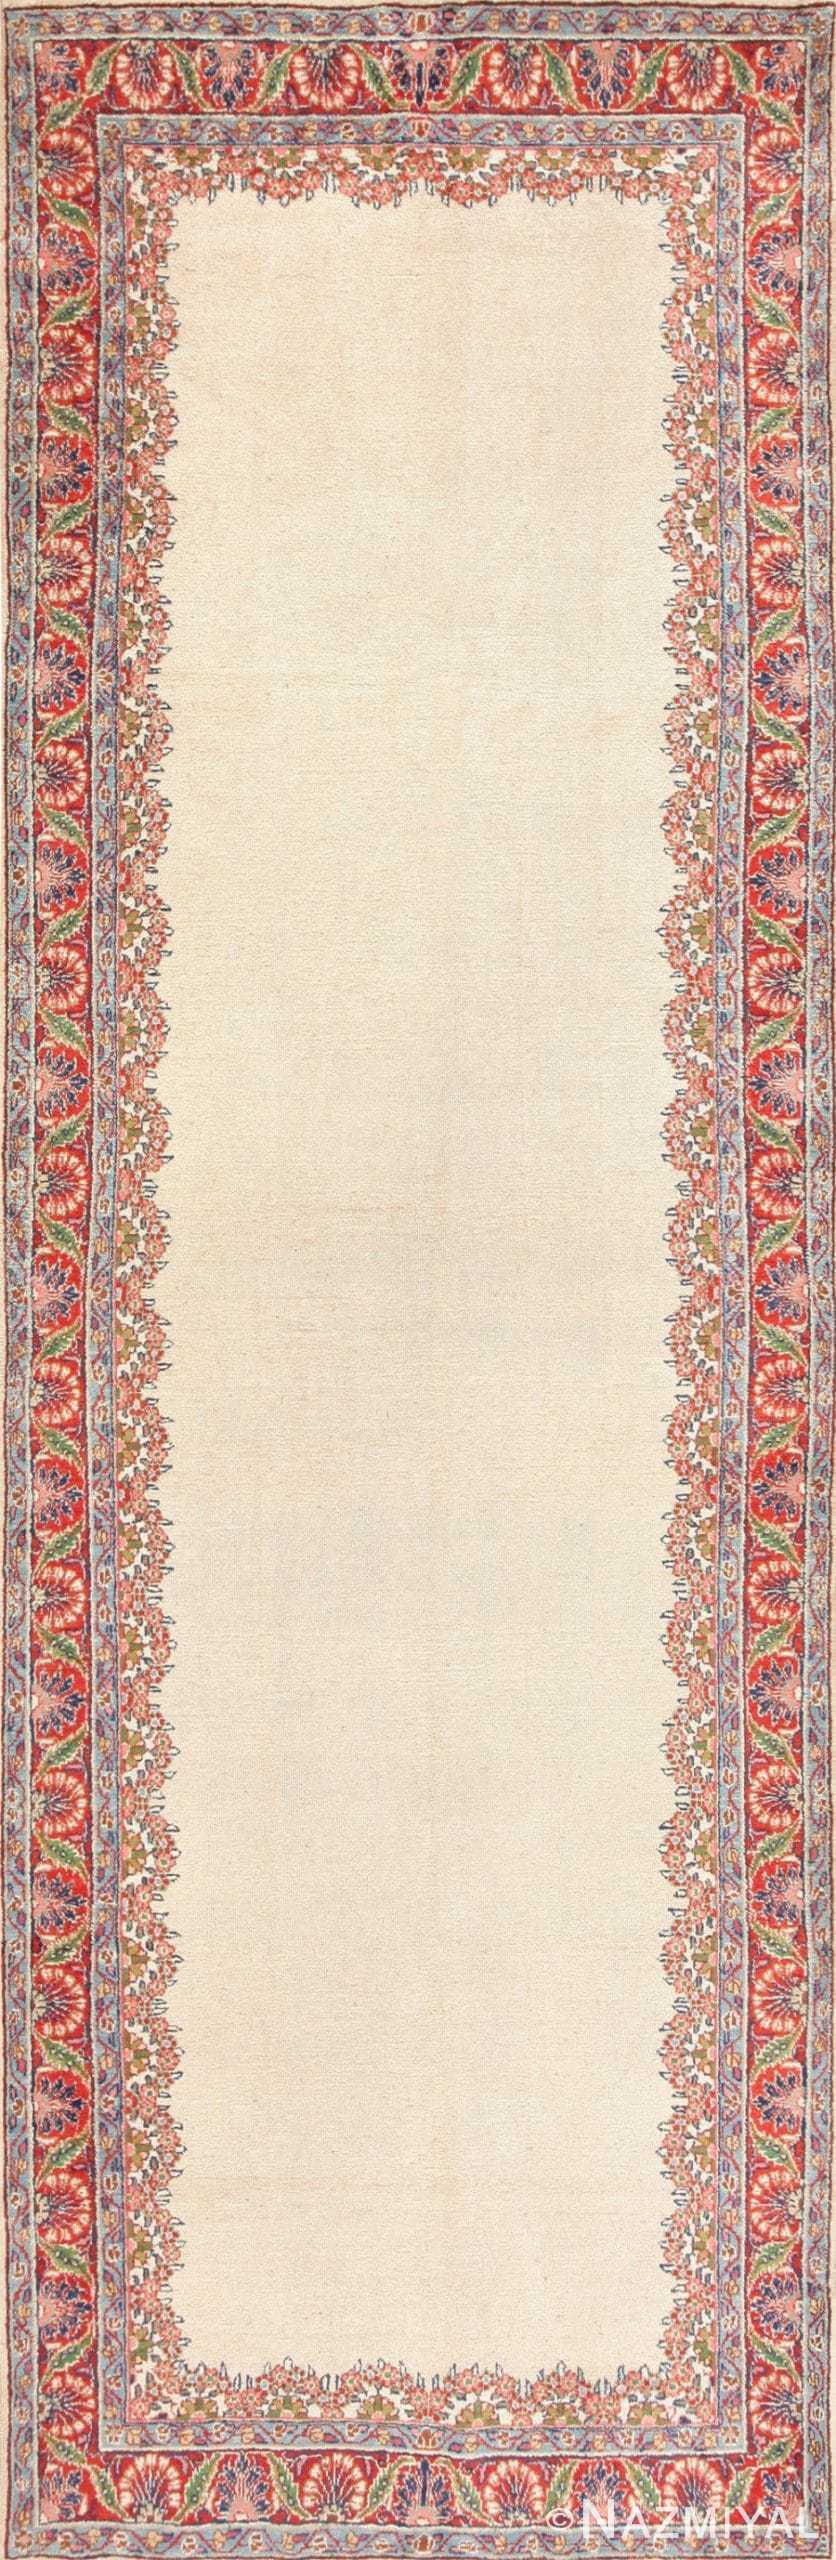 Antique Persian Mahal Carpet 47298 Detail/Large View